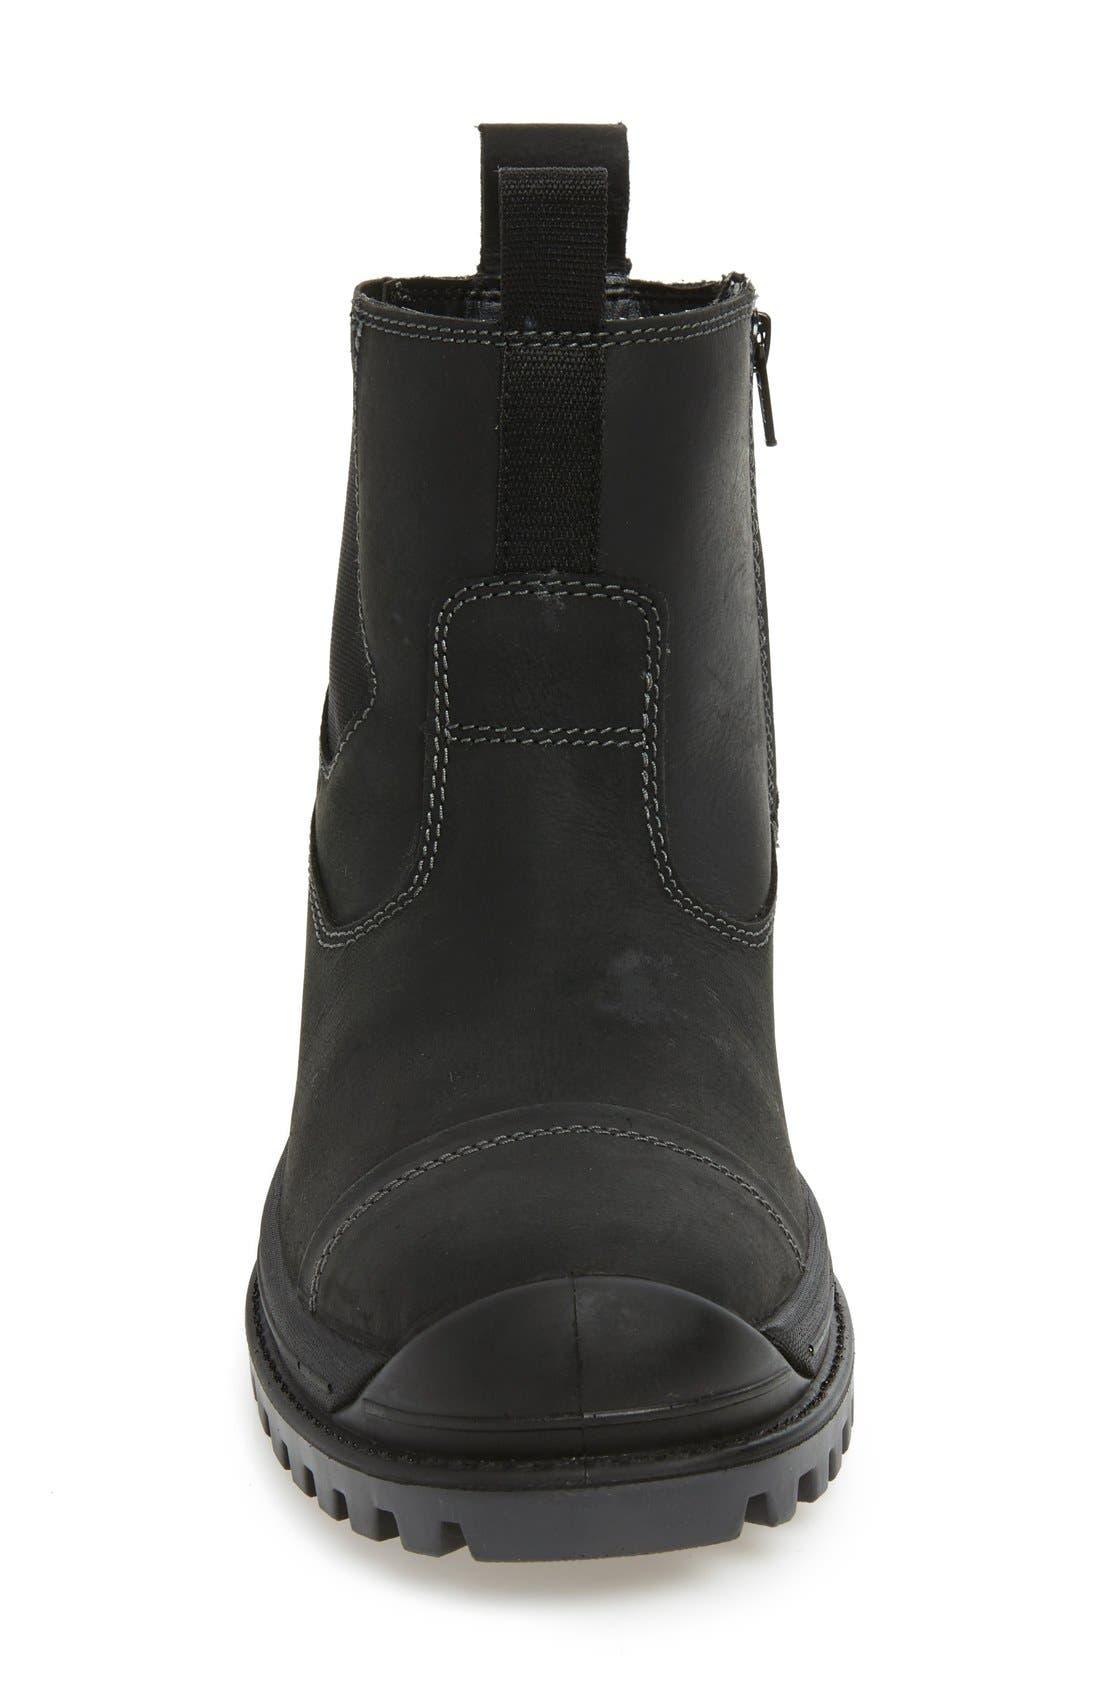 Griffon Snow Boot,                             Alternate thumbnail 3, color,                             Black Leather